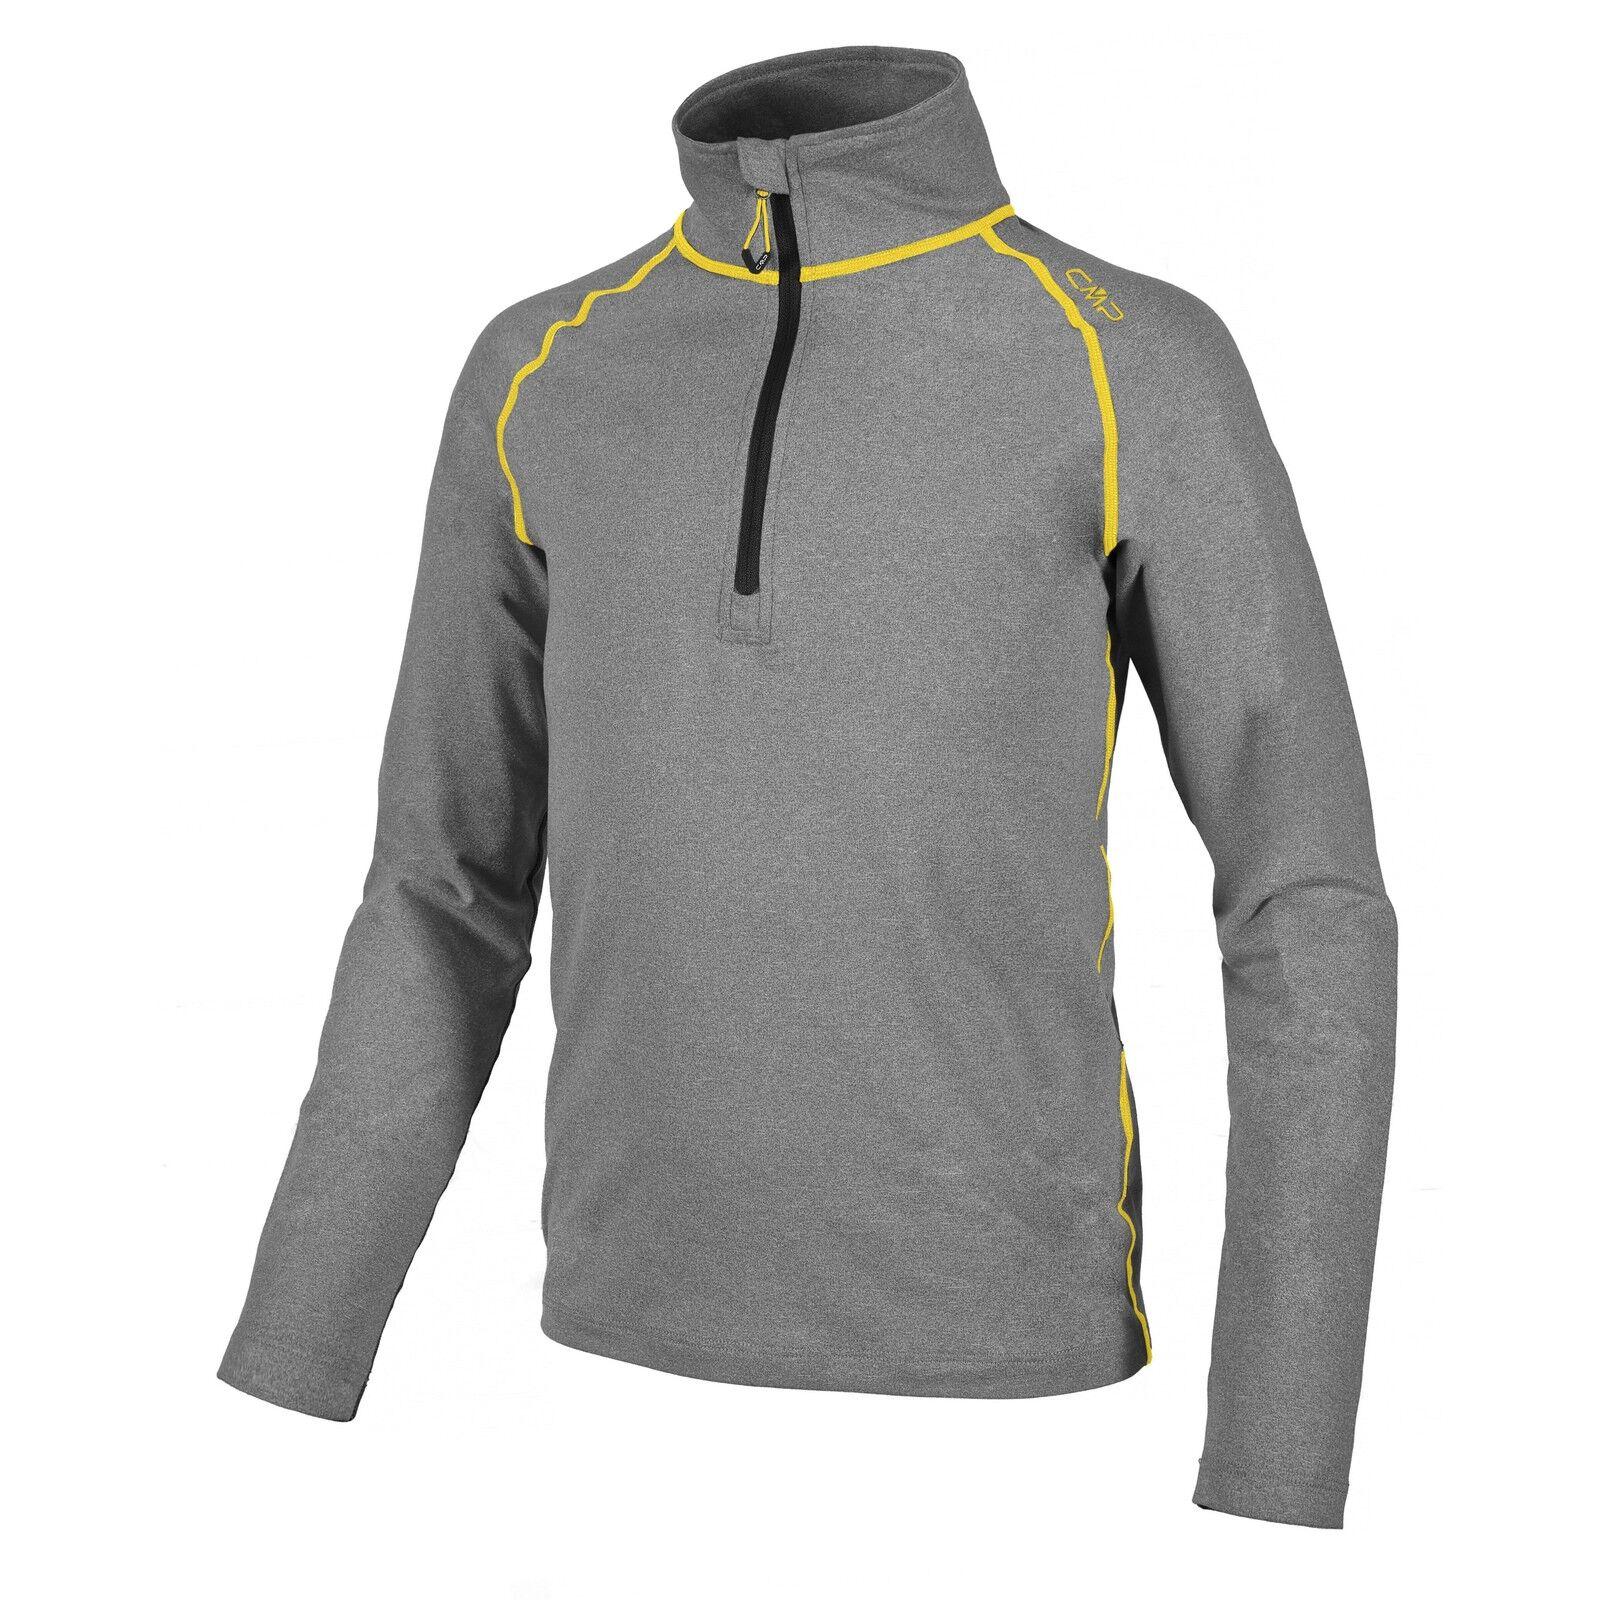 CMP Sweatshirt Function Top Grey  Collar Stretch SOFTECH LIGHT  2018 latest